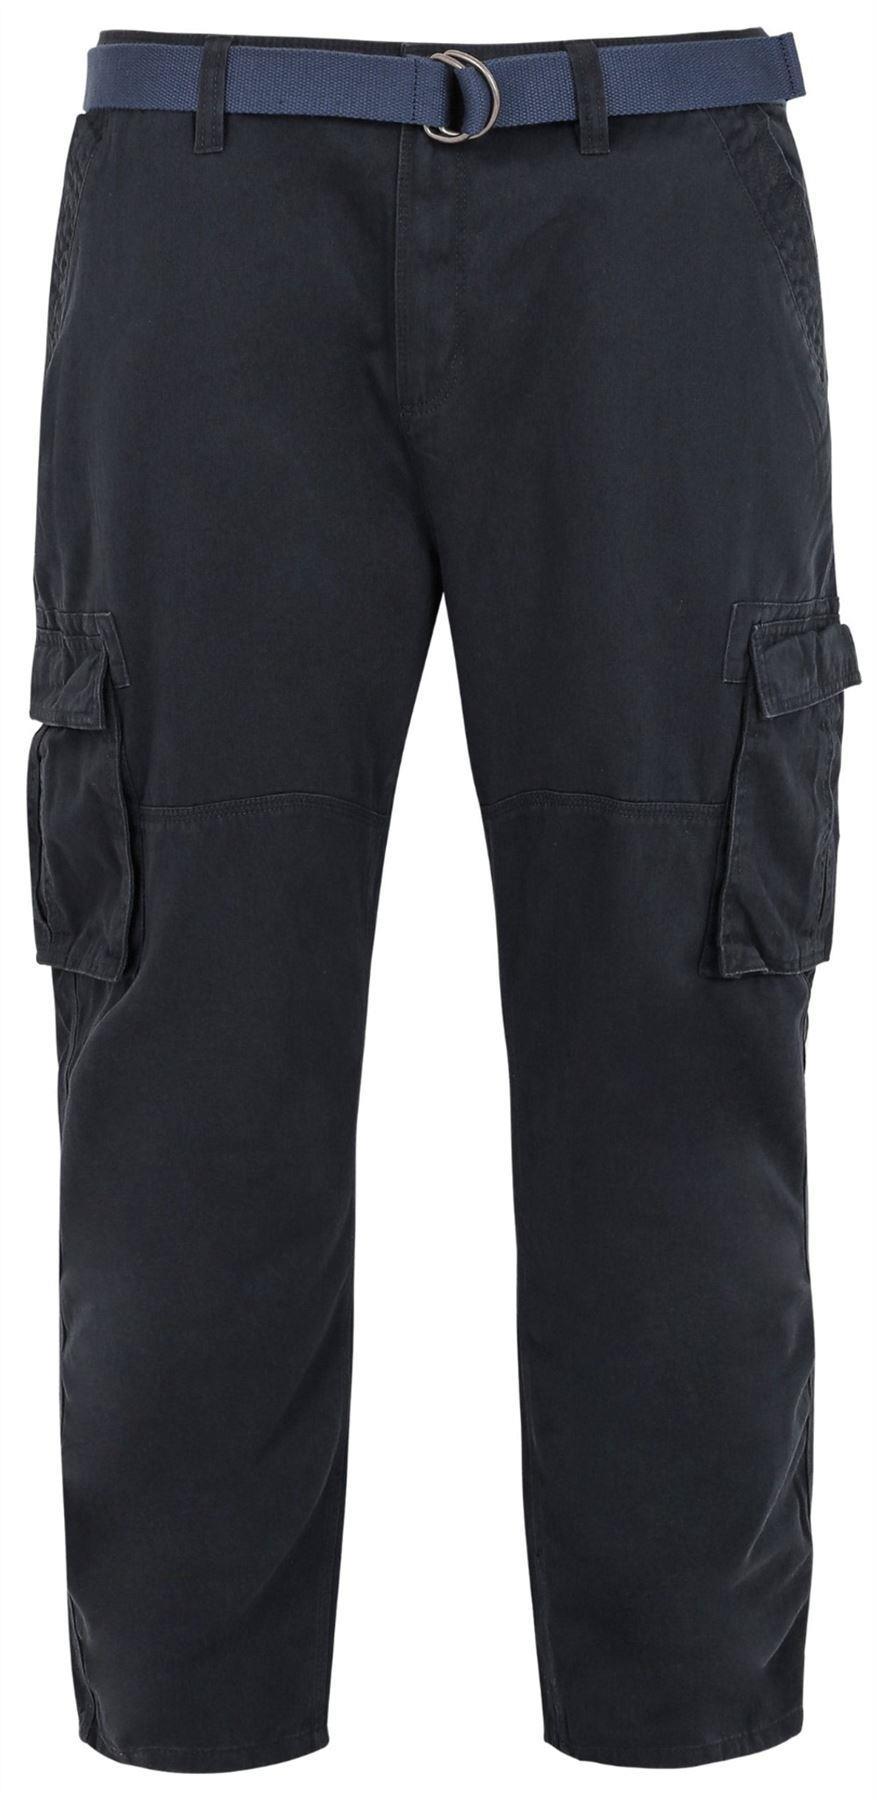 Bad Rhino Cargo Trousers - Navy